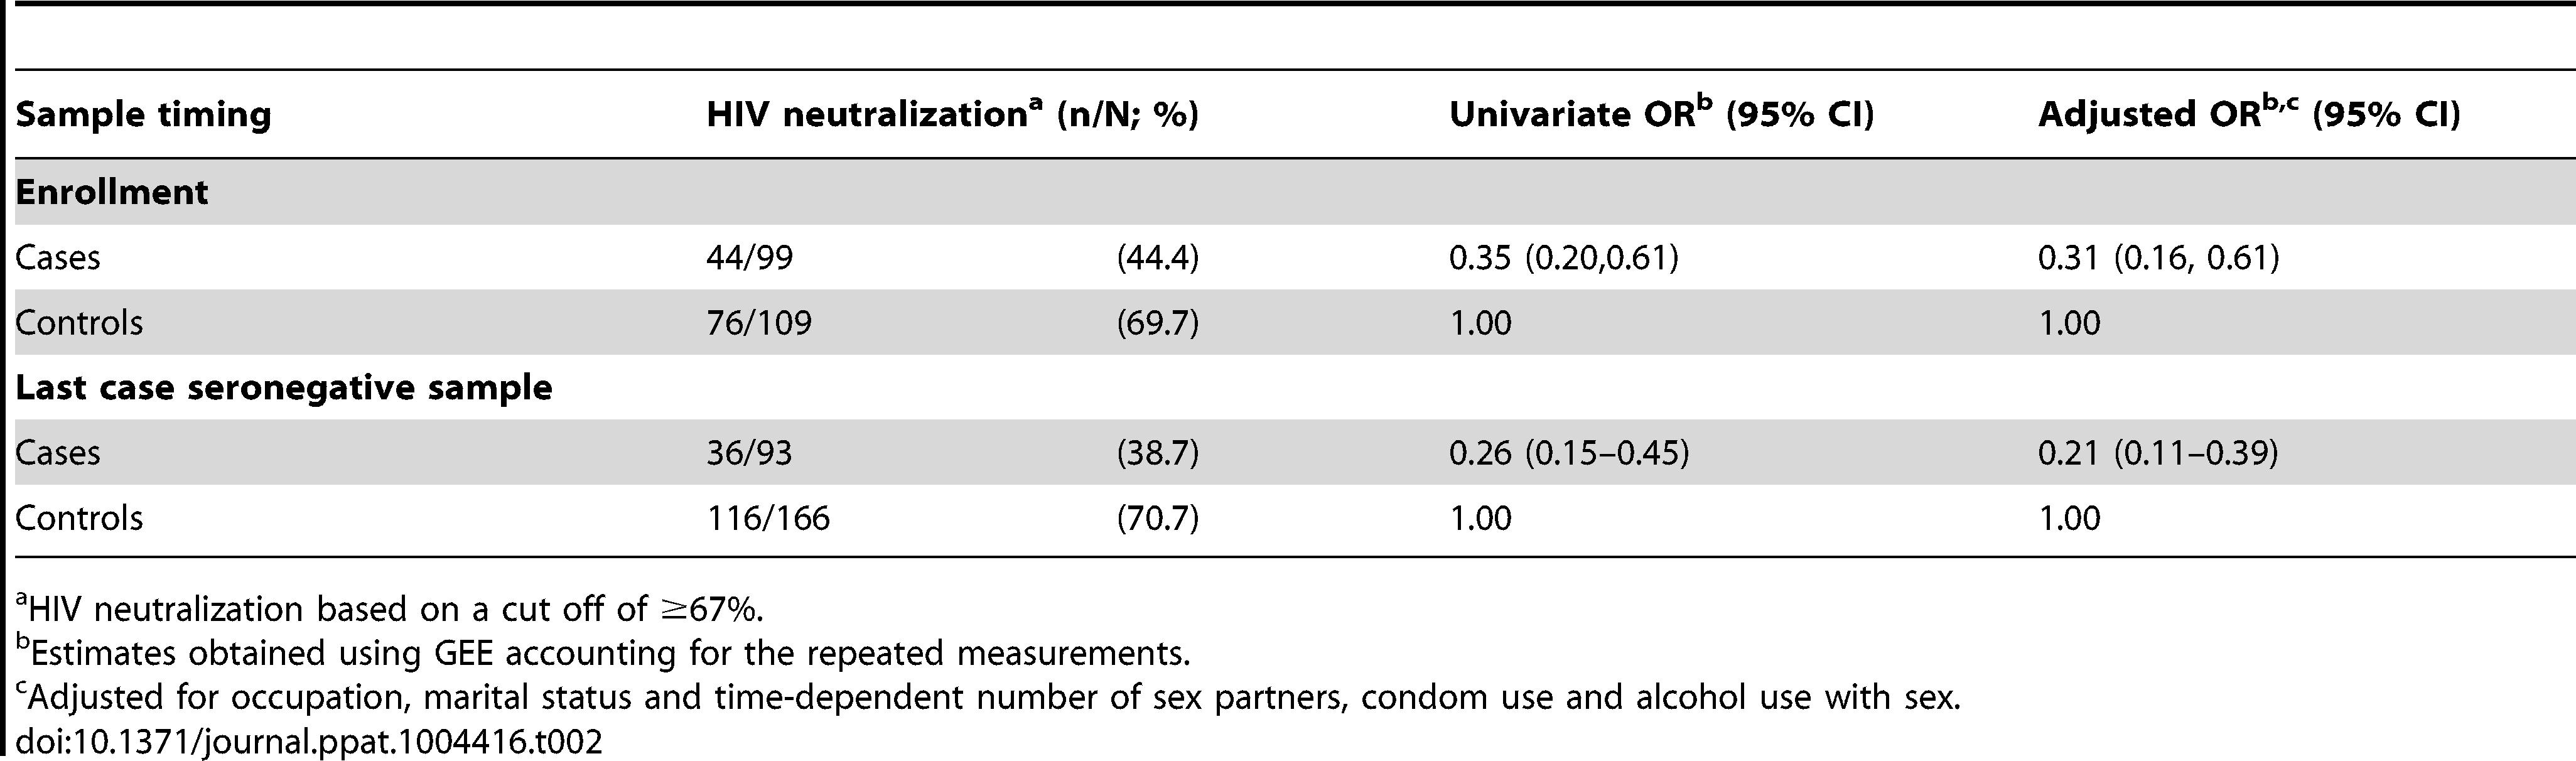 Sub-preputial HIV neutralizing IgA and HIV acquisition.